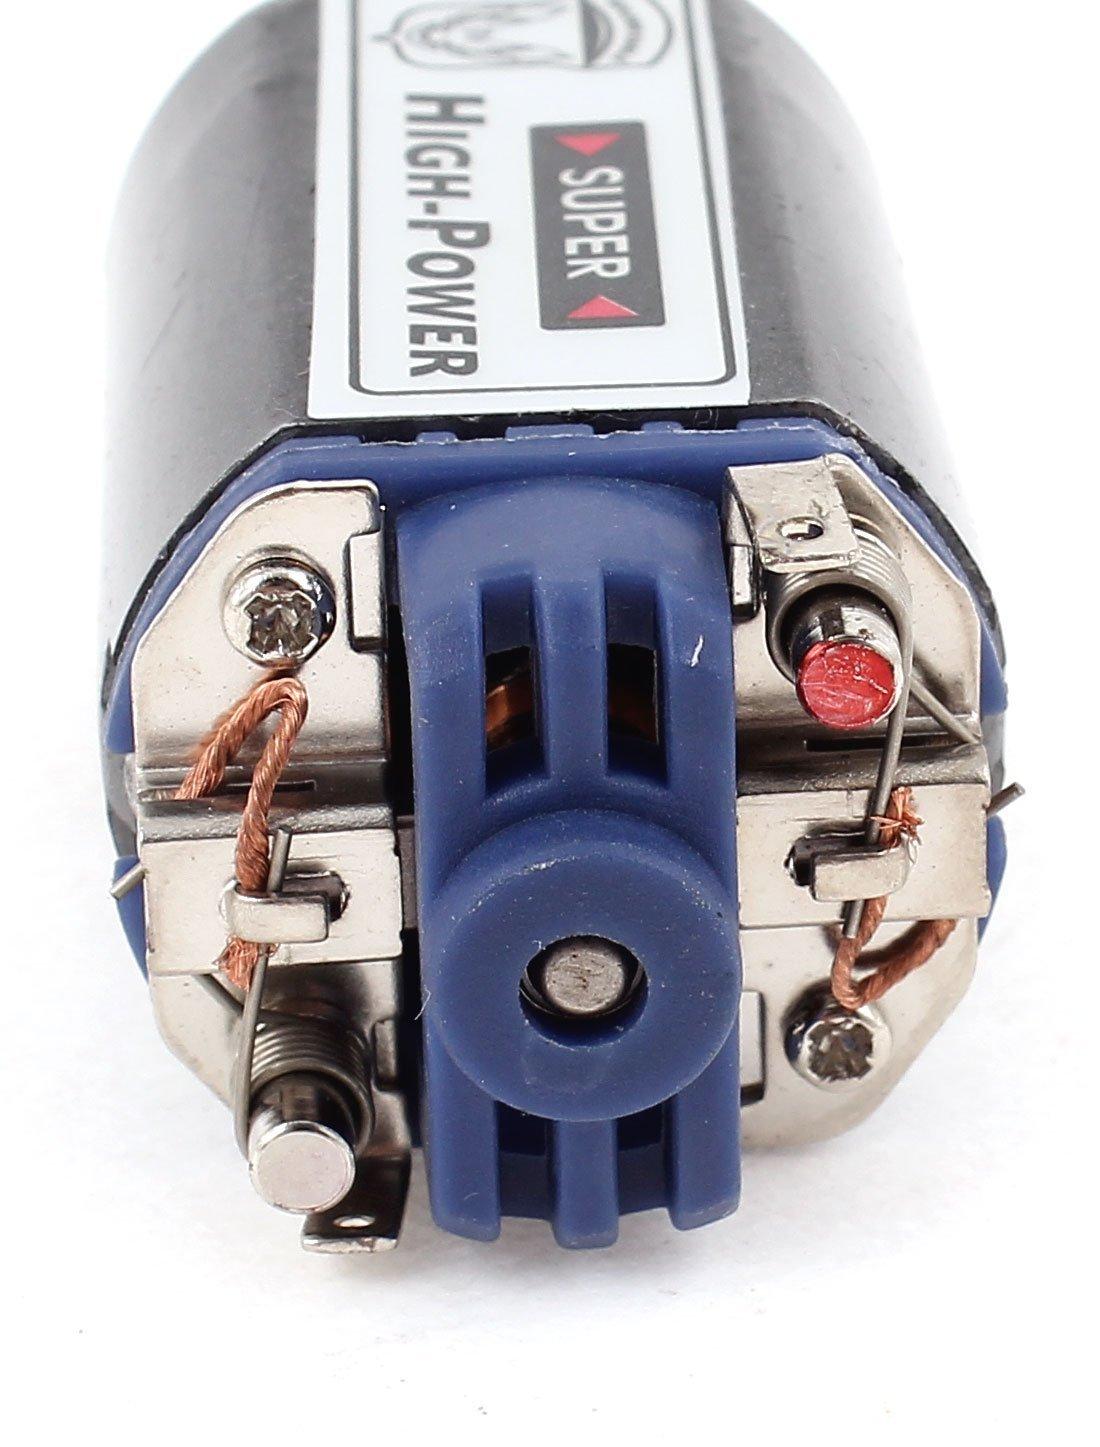 eDealMax a15040700ux0103 6V DC-9V 14500RPM-24500RPM Potente magnética arma eléctrico del Motor Start 440-7522: Amazon.com: Industrial & Scientific